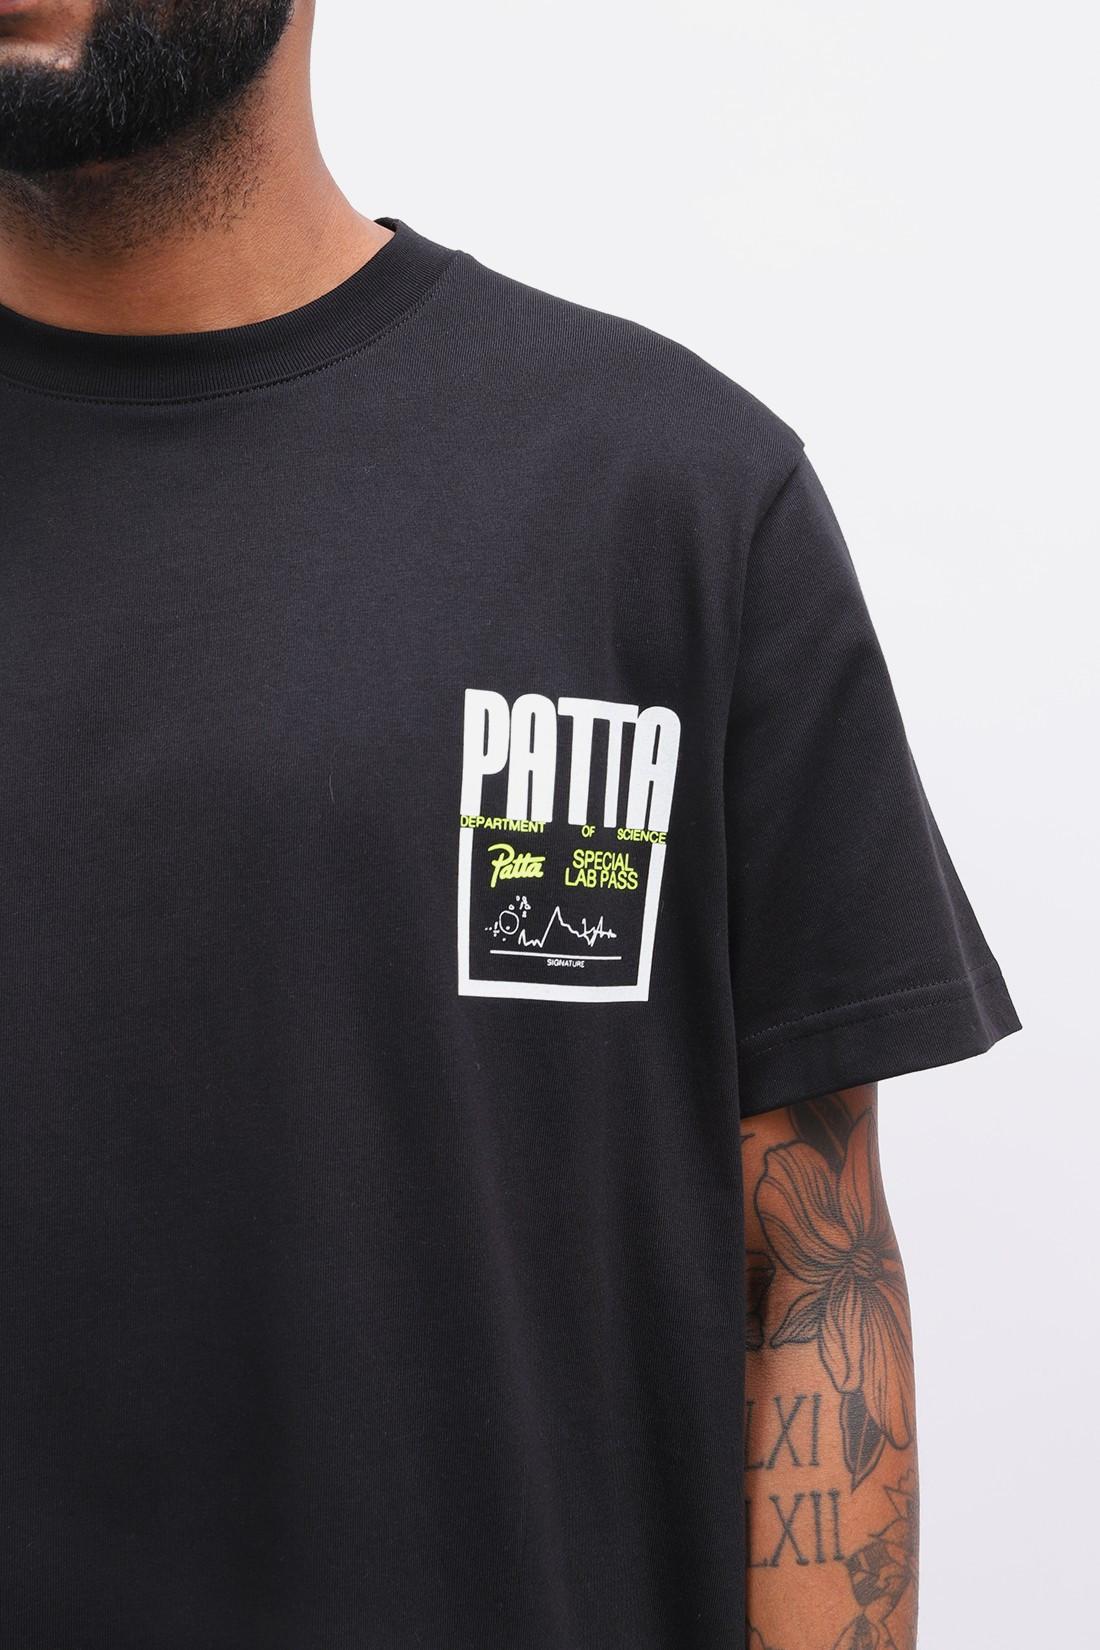 PATTA / Patta values ss t-shirt Black